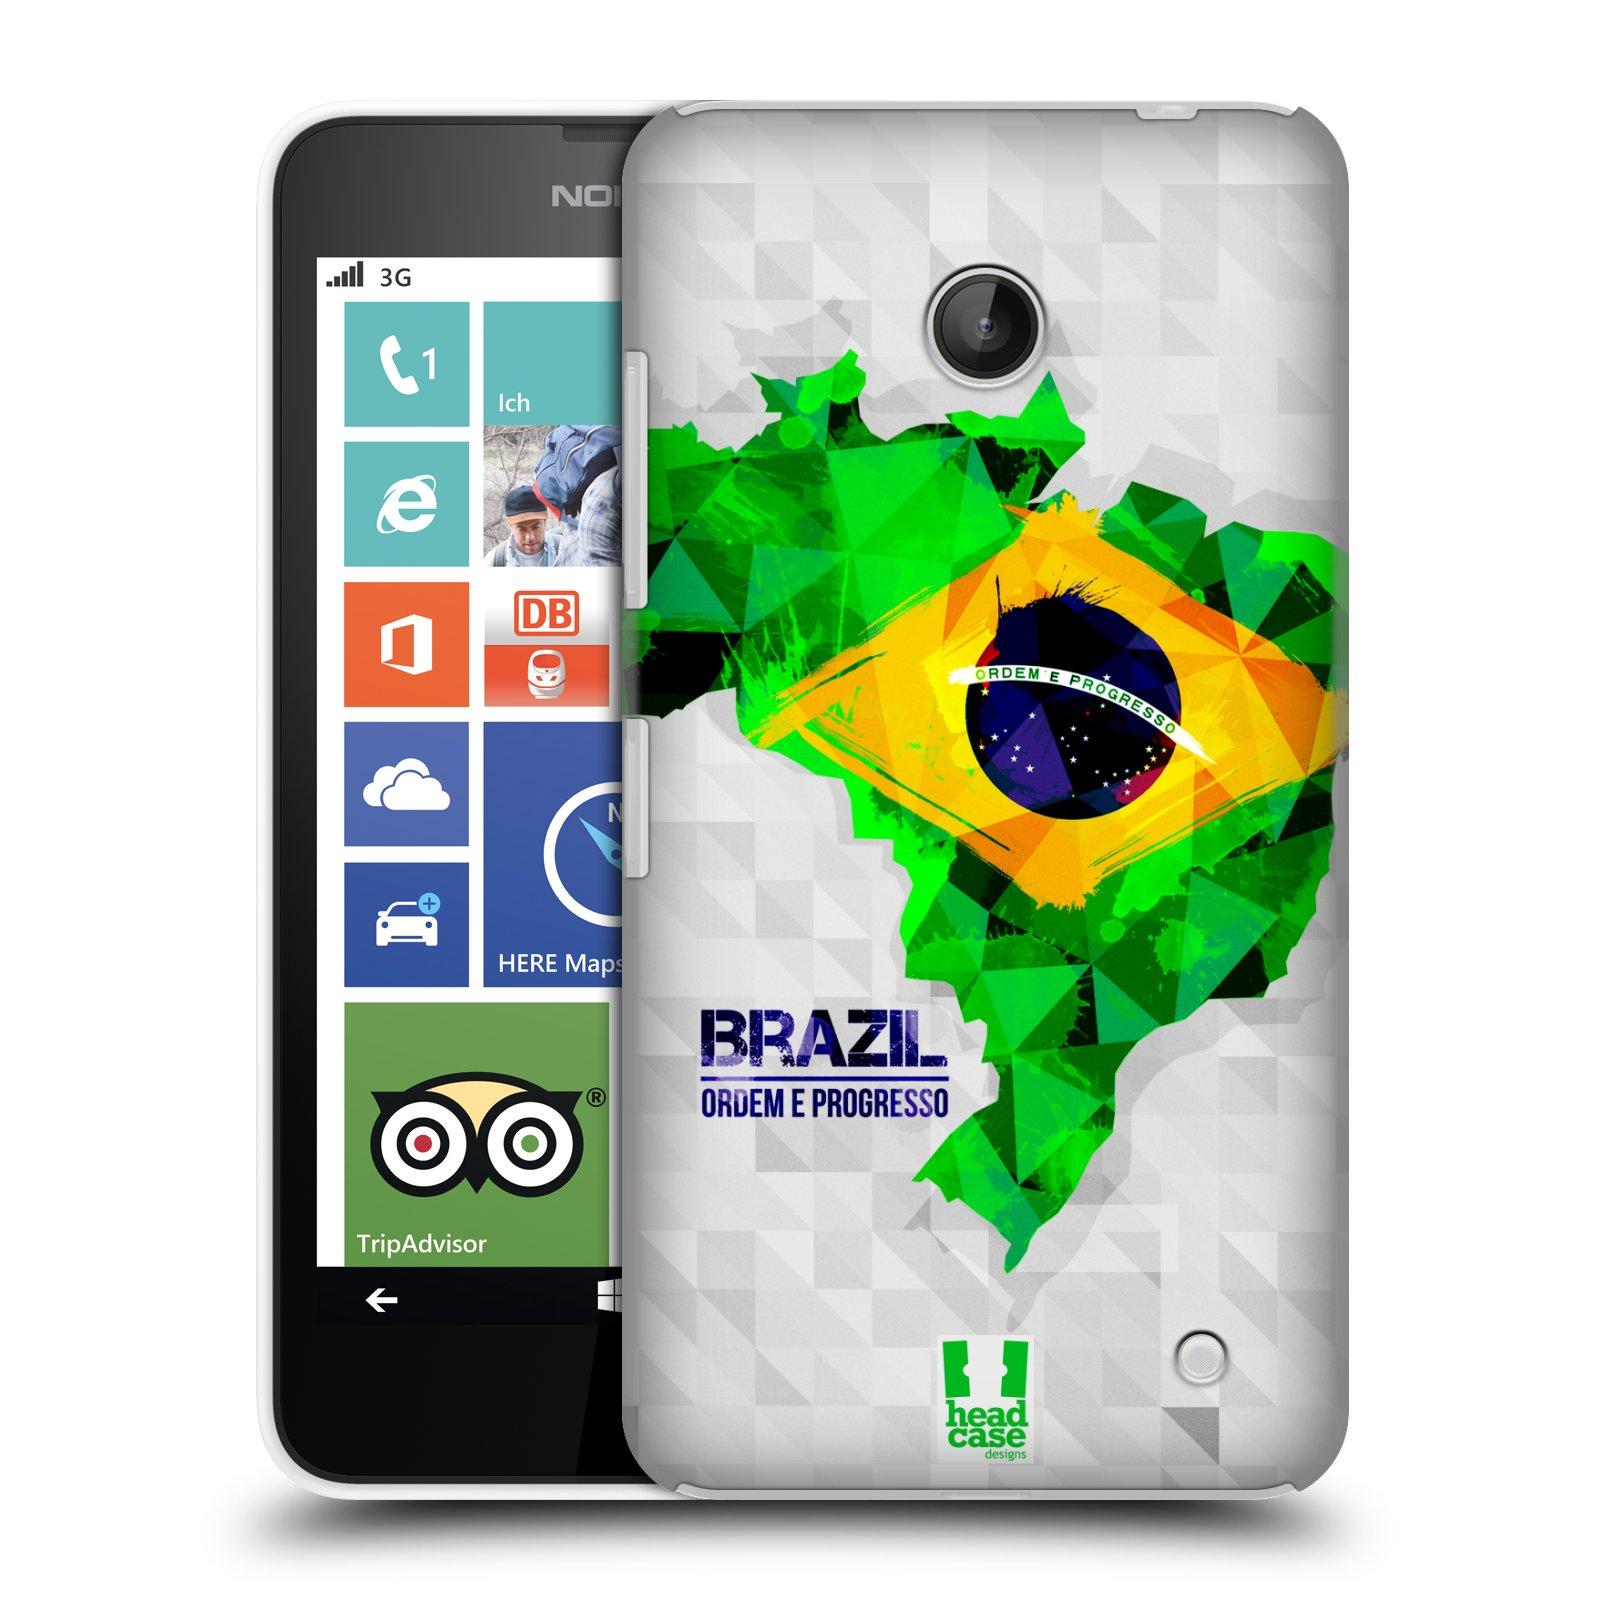 Plastové pouzdro na mobil Nokia Lumia 630 HEAD CASE GEOMAPA BRAZÍLIE (Kryt či obal na mobilní telefon Nokia Lumia 630 a Nokia Lumia 630 Dual SIM)